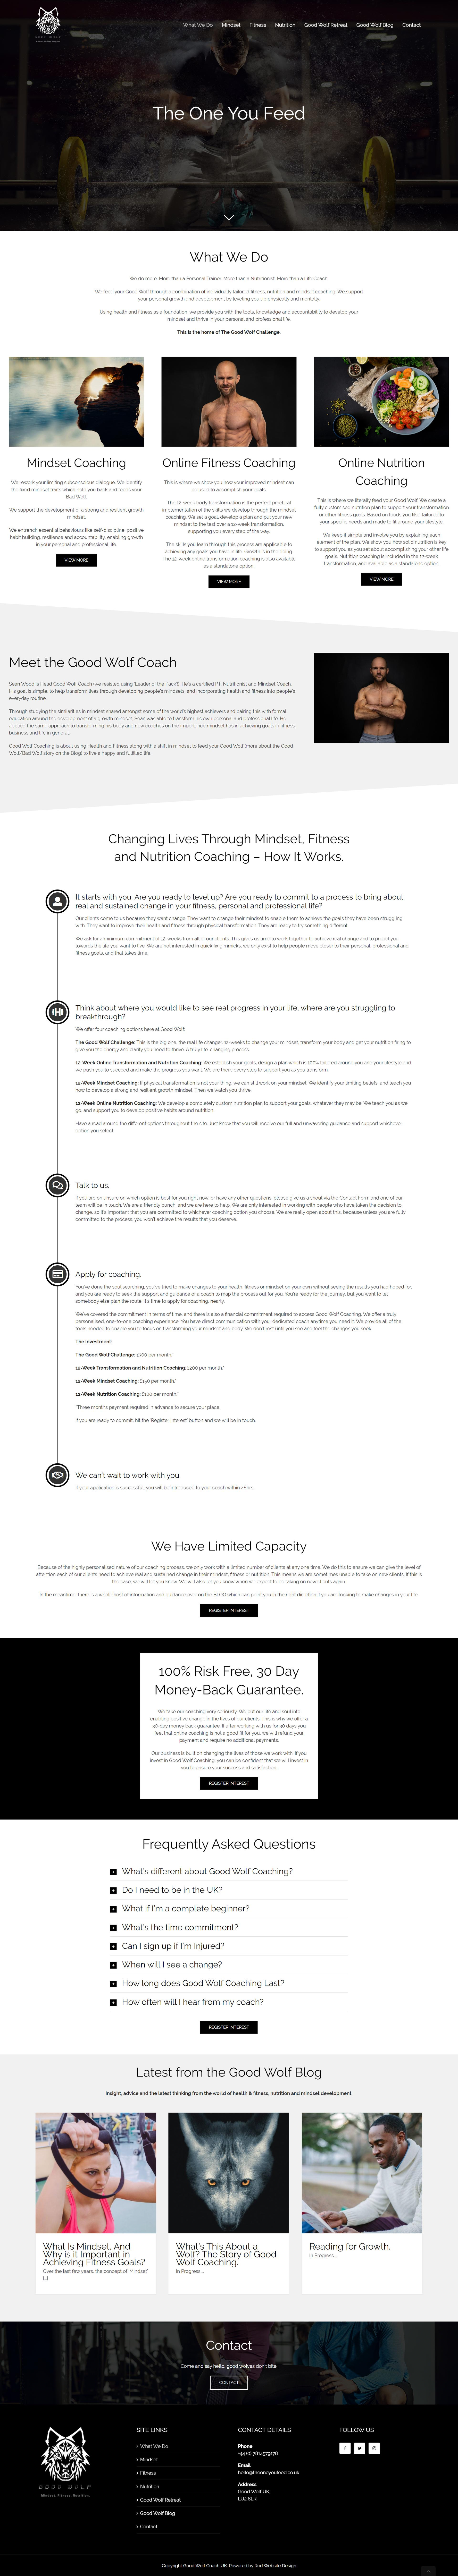 Web Design Hitchin